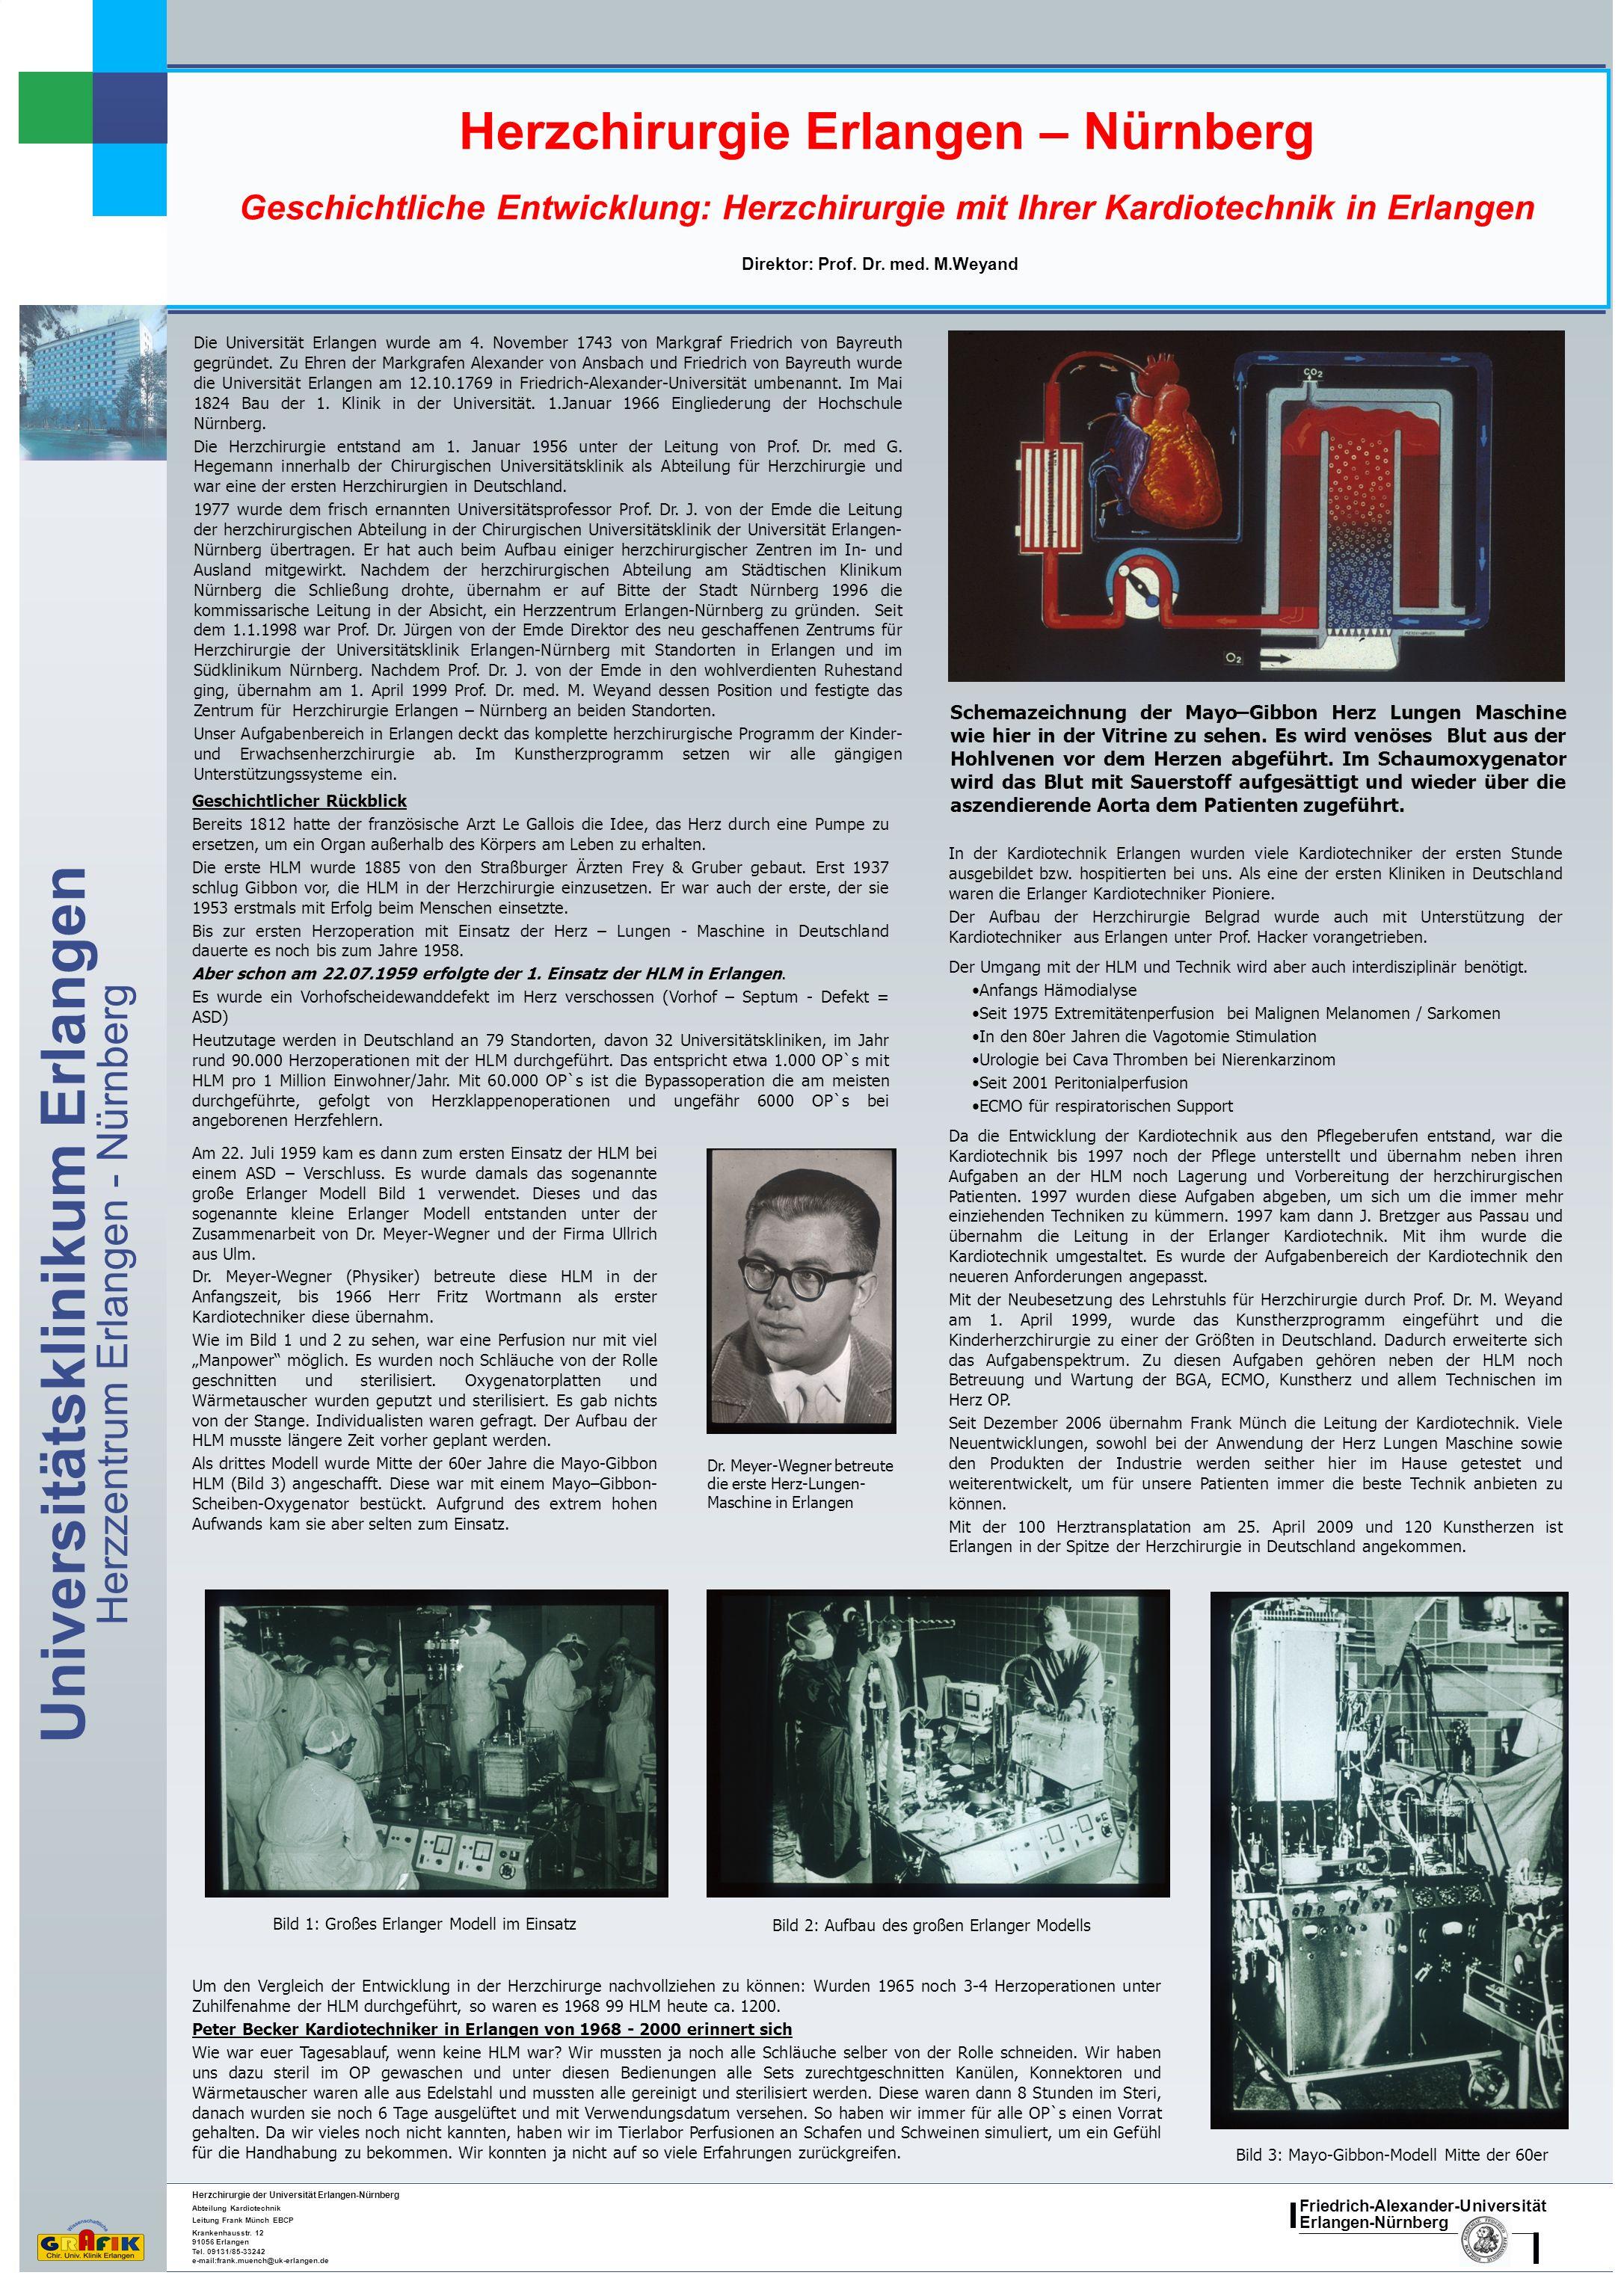 Herzchirurgie Erlangen – Nürnberg Direktor: Prof. Dr. med. M.Weyand